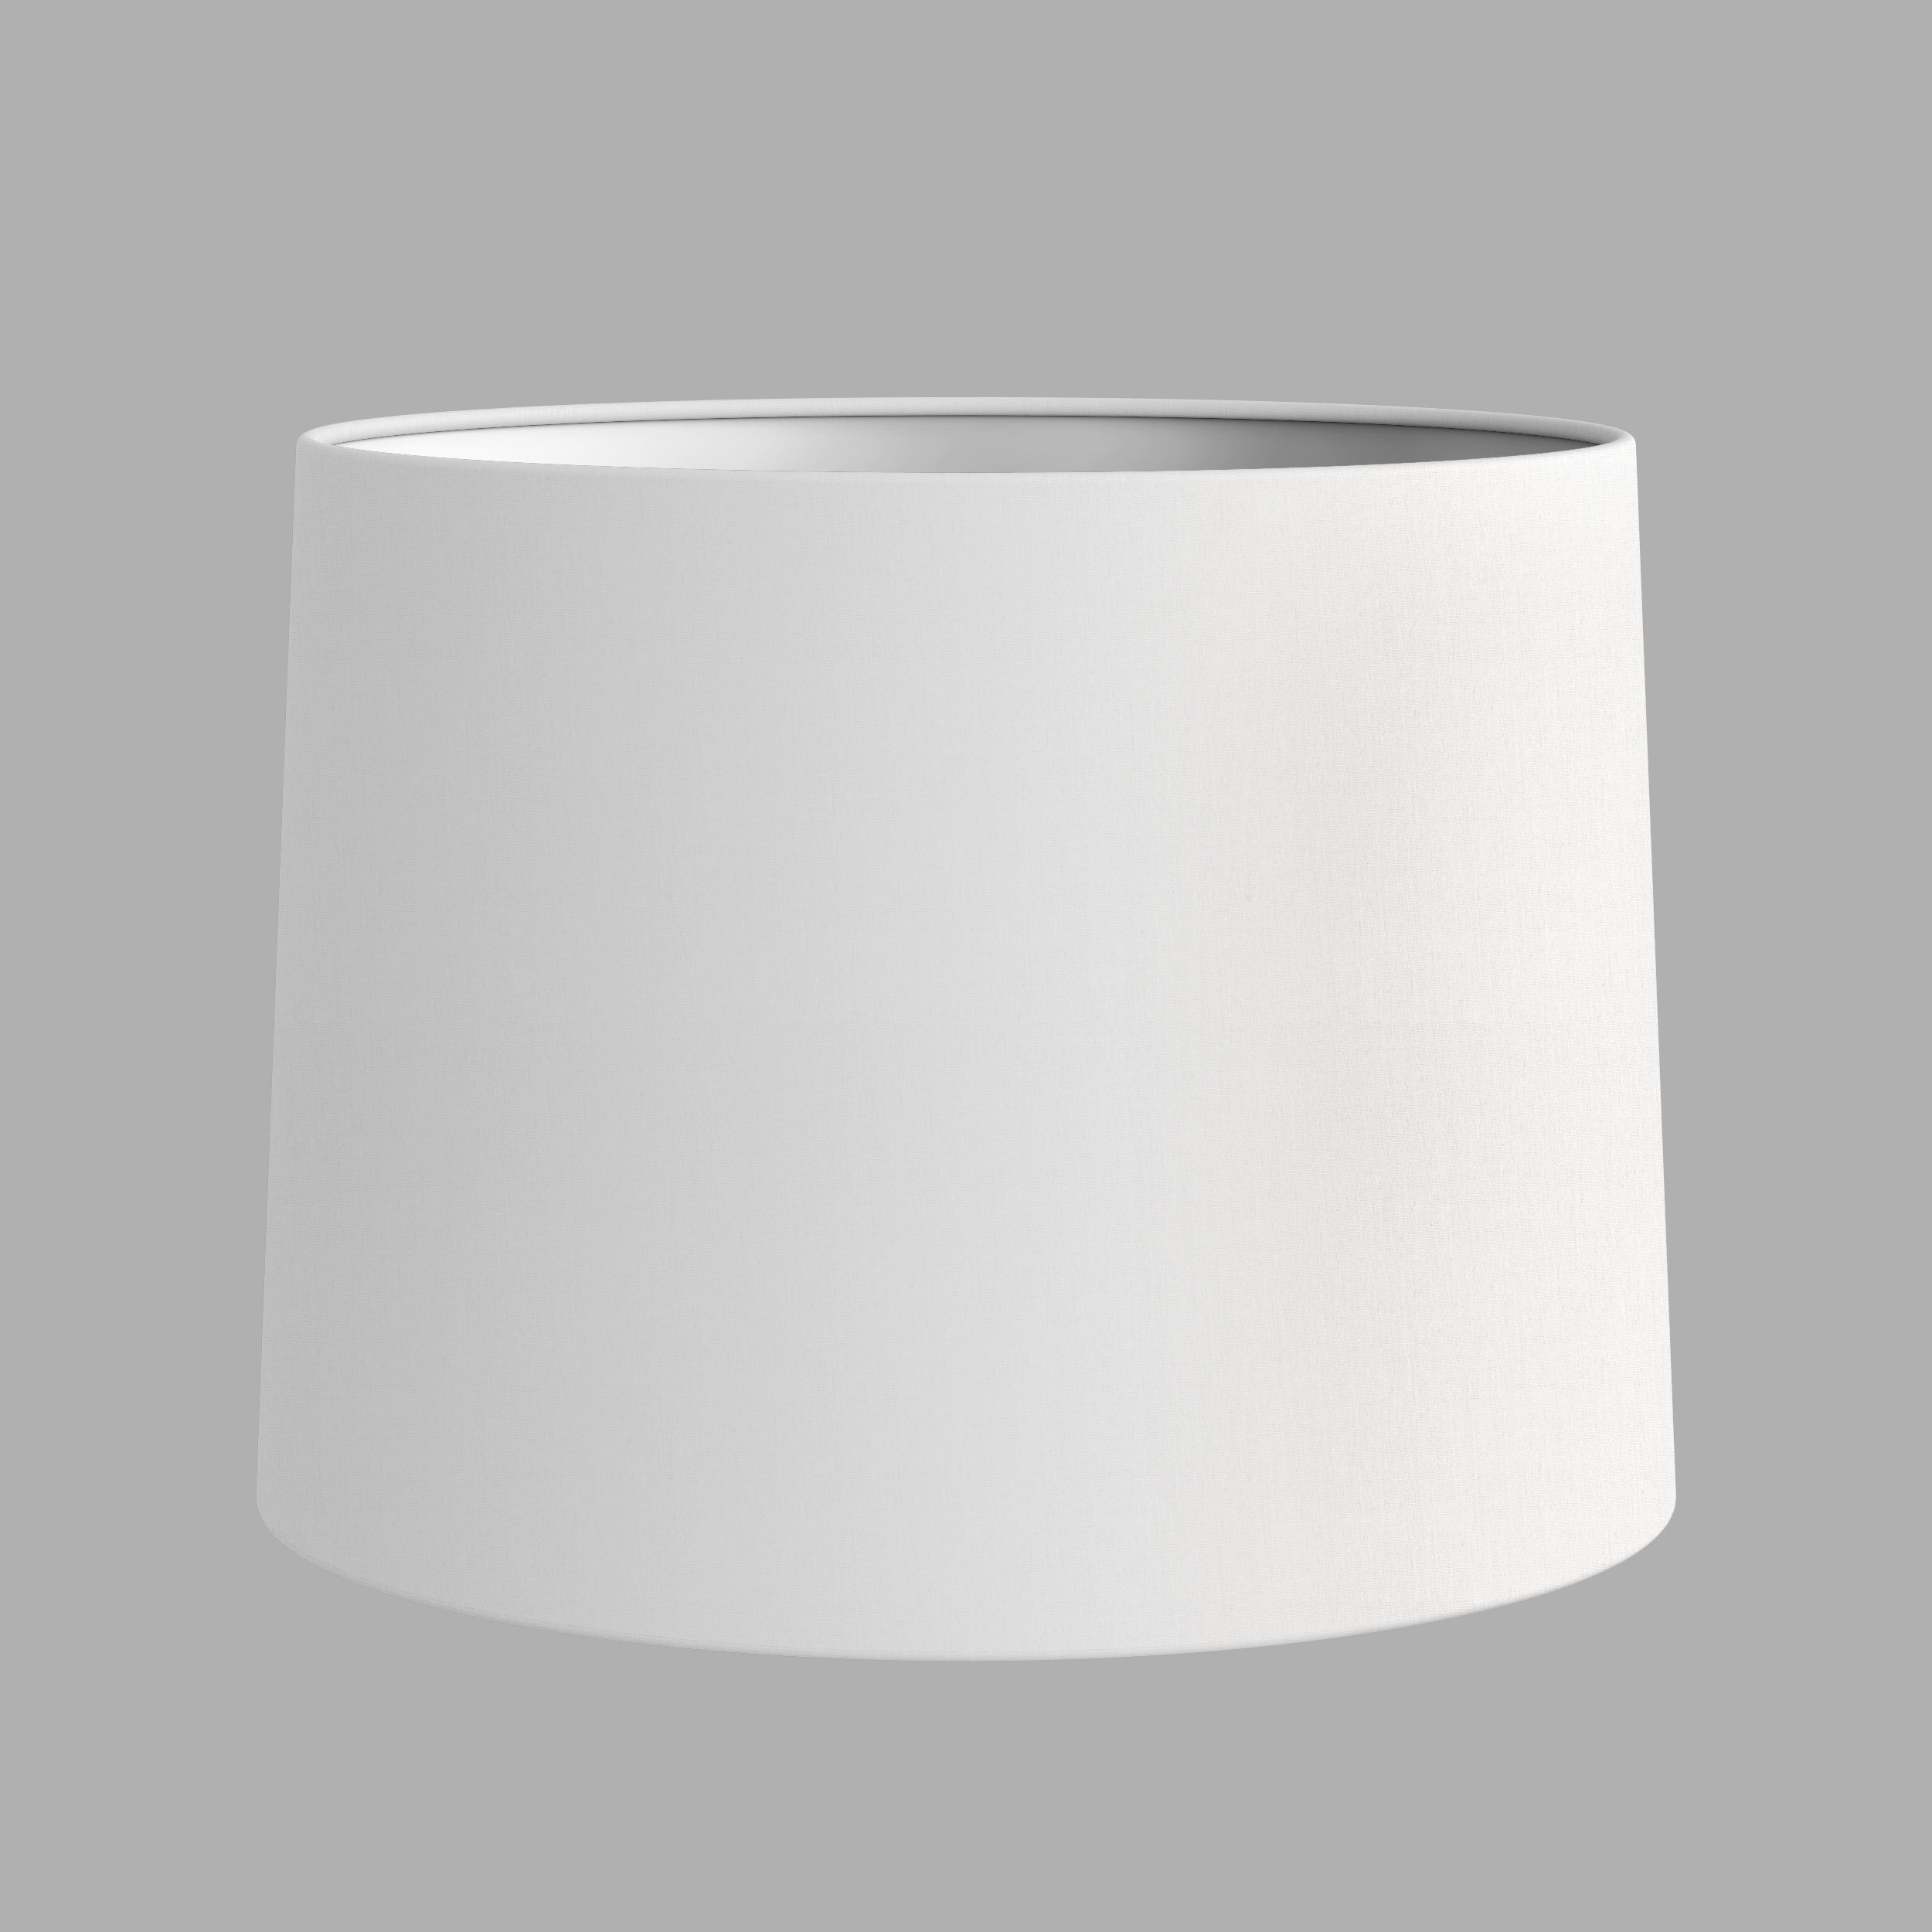 Абажур Astro Tapered Drum 5013001 (4049), белый, текстиль - фото 2